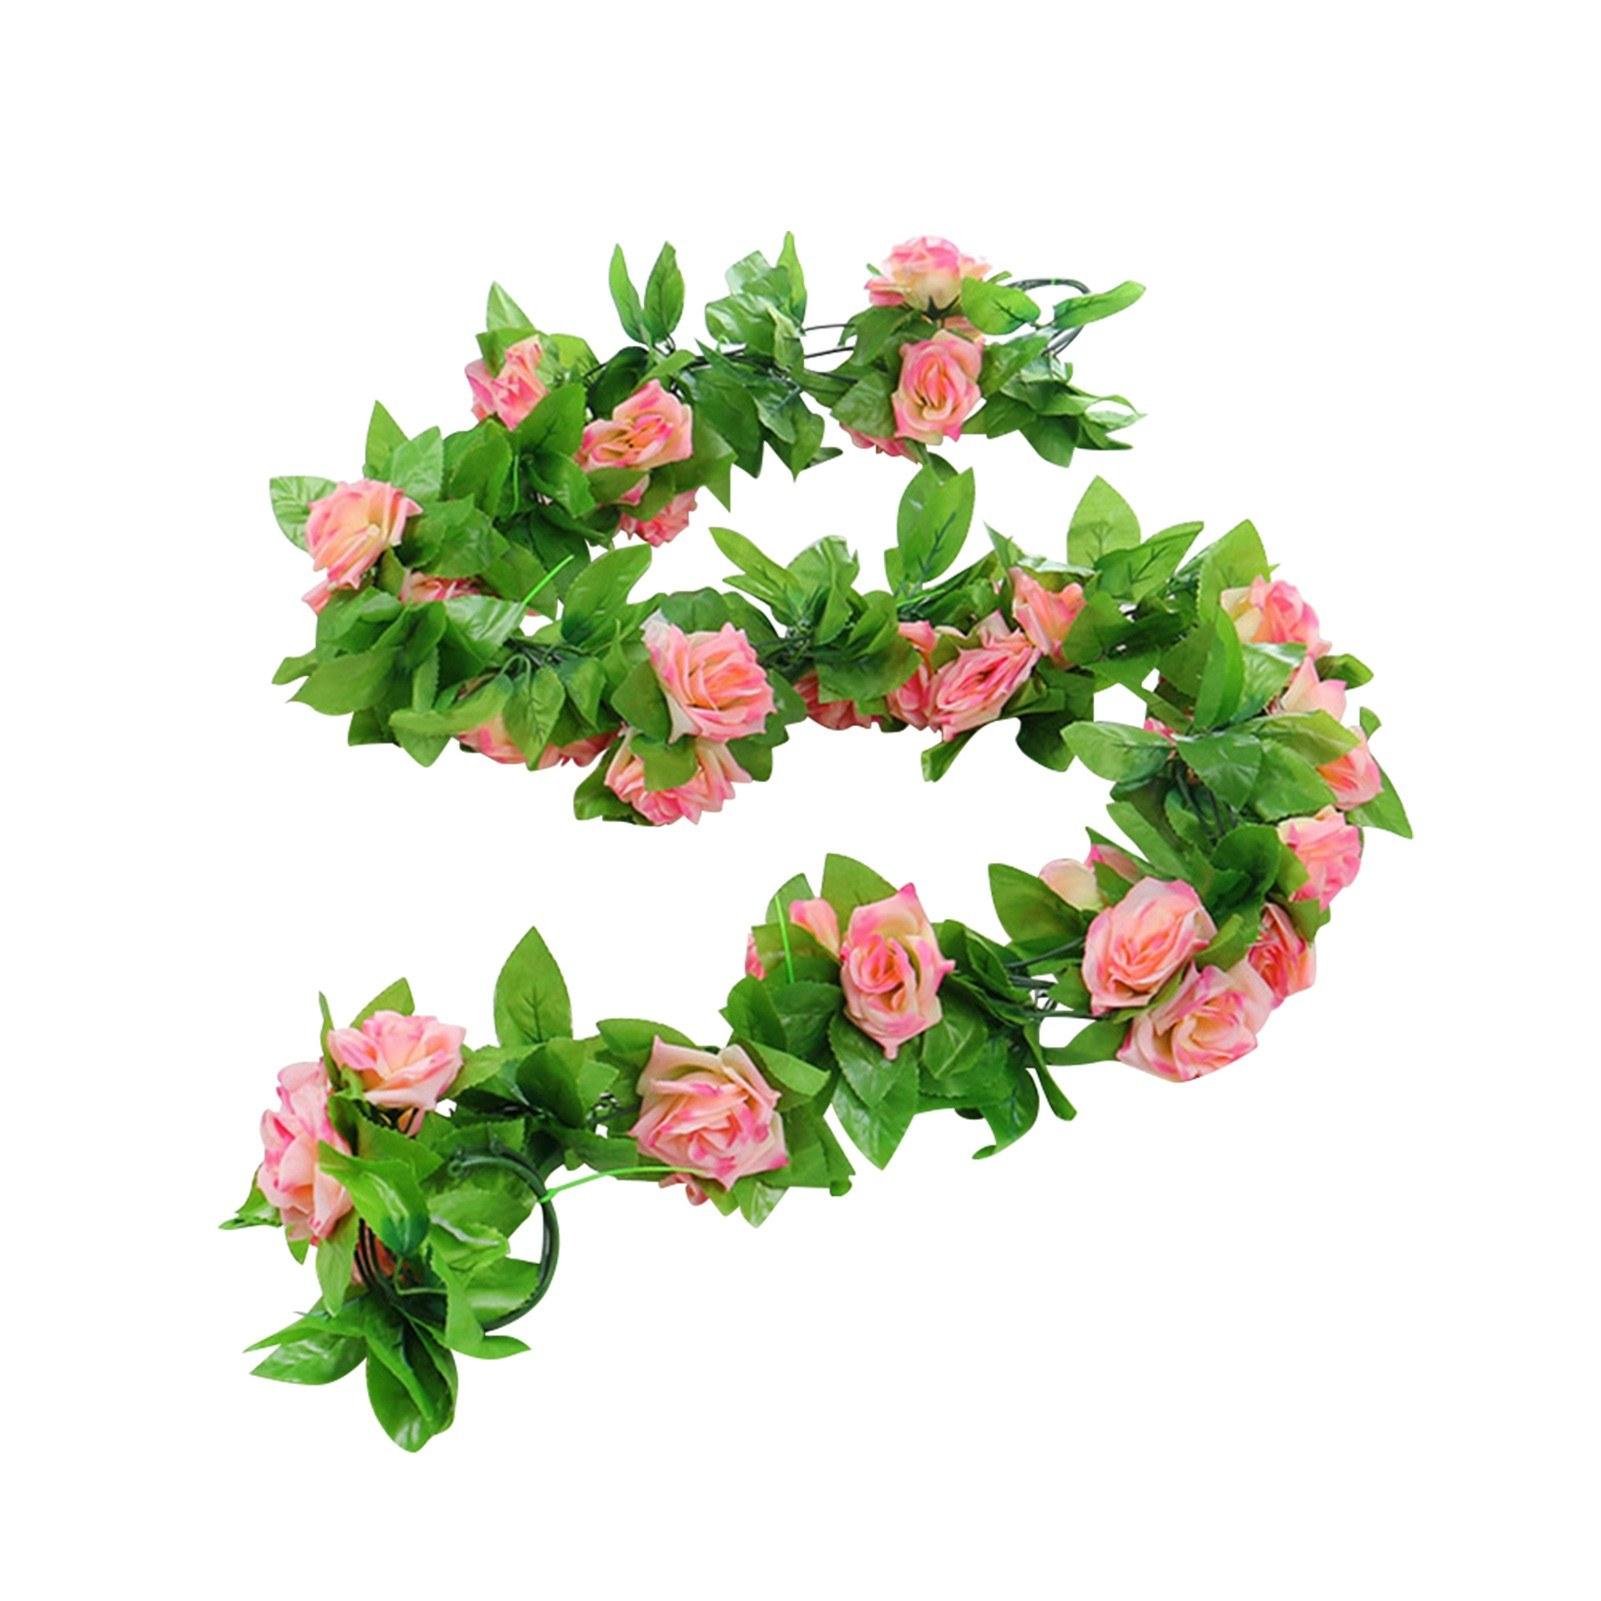 Tomtop - 78% OFF Flower Garland Fake Rose Vine, Free Shipping $10.49